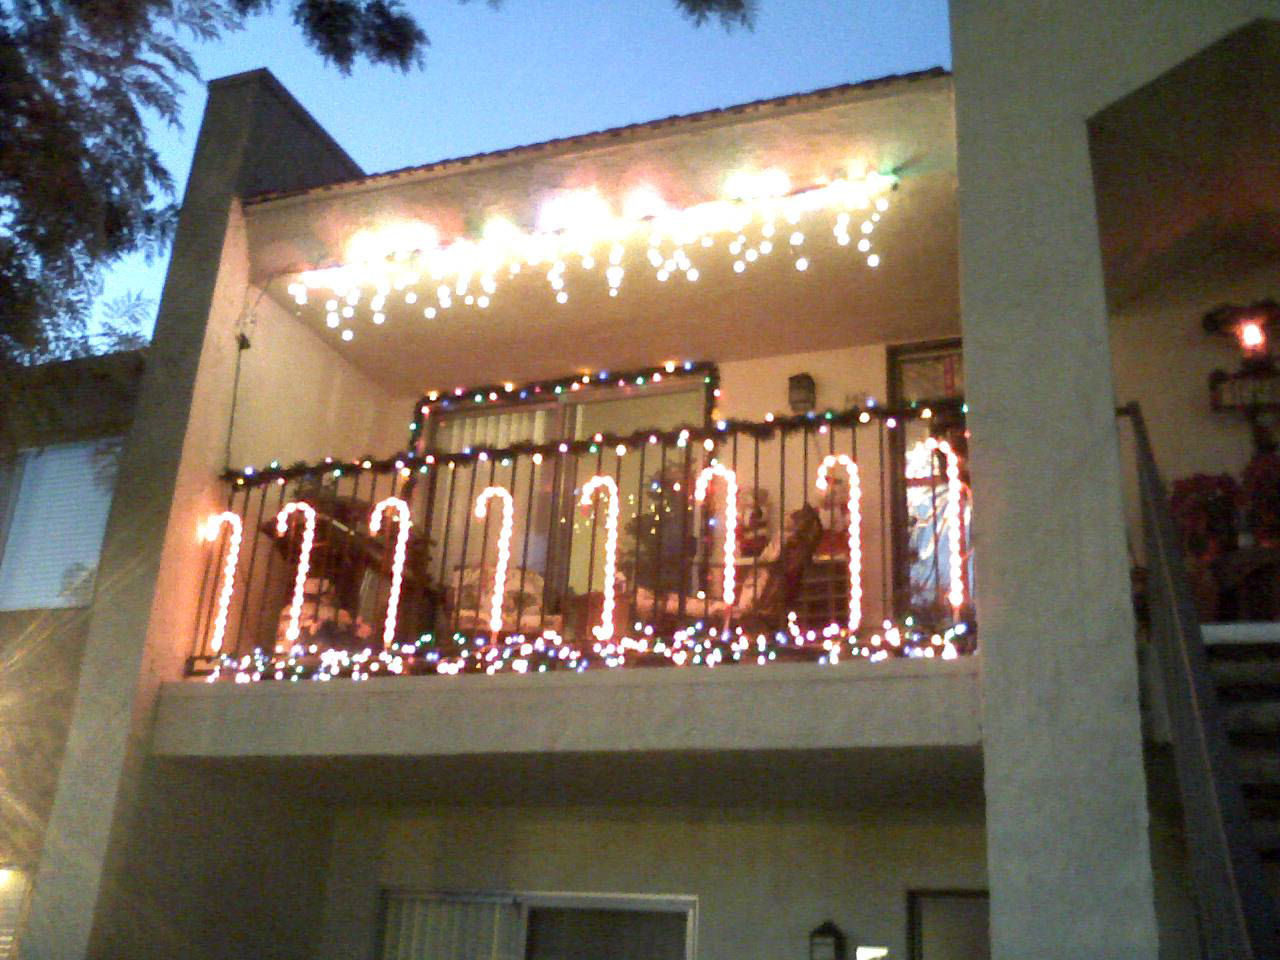 Apartment Patio Christmas Decorating Ideas  apartment patio christmas decorating ideas